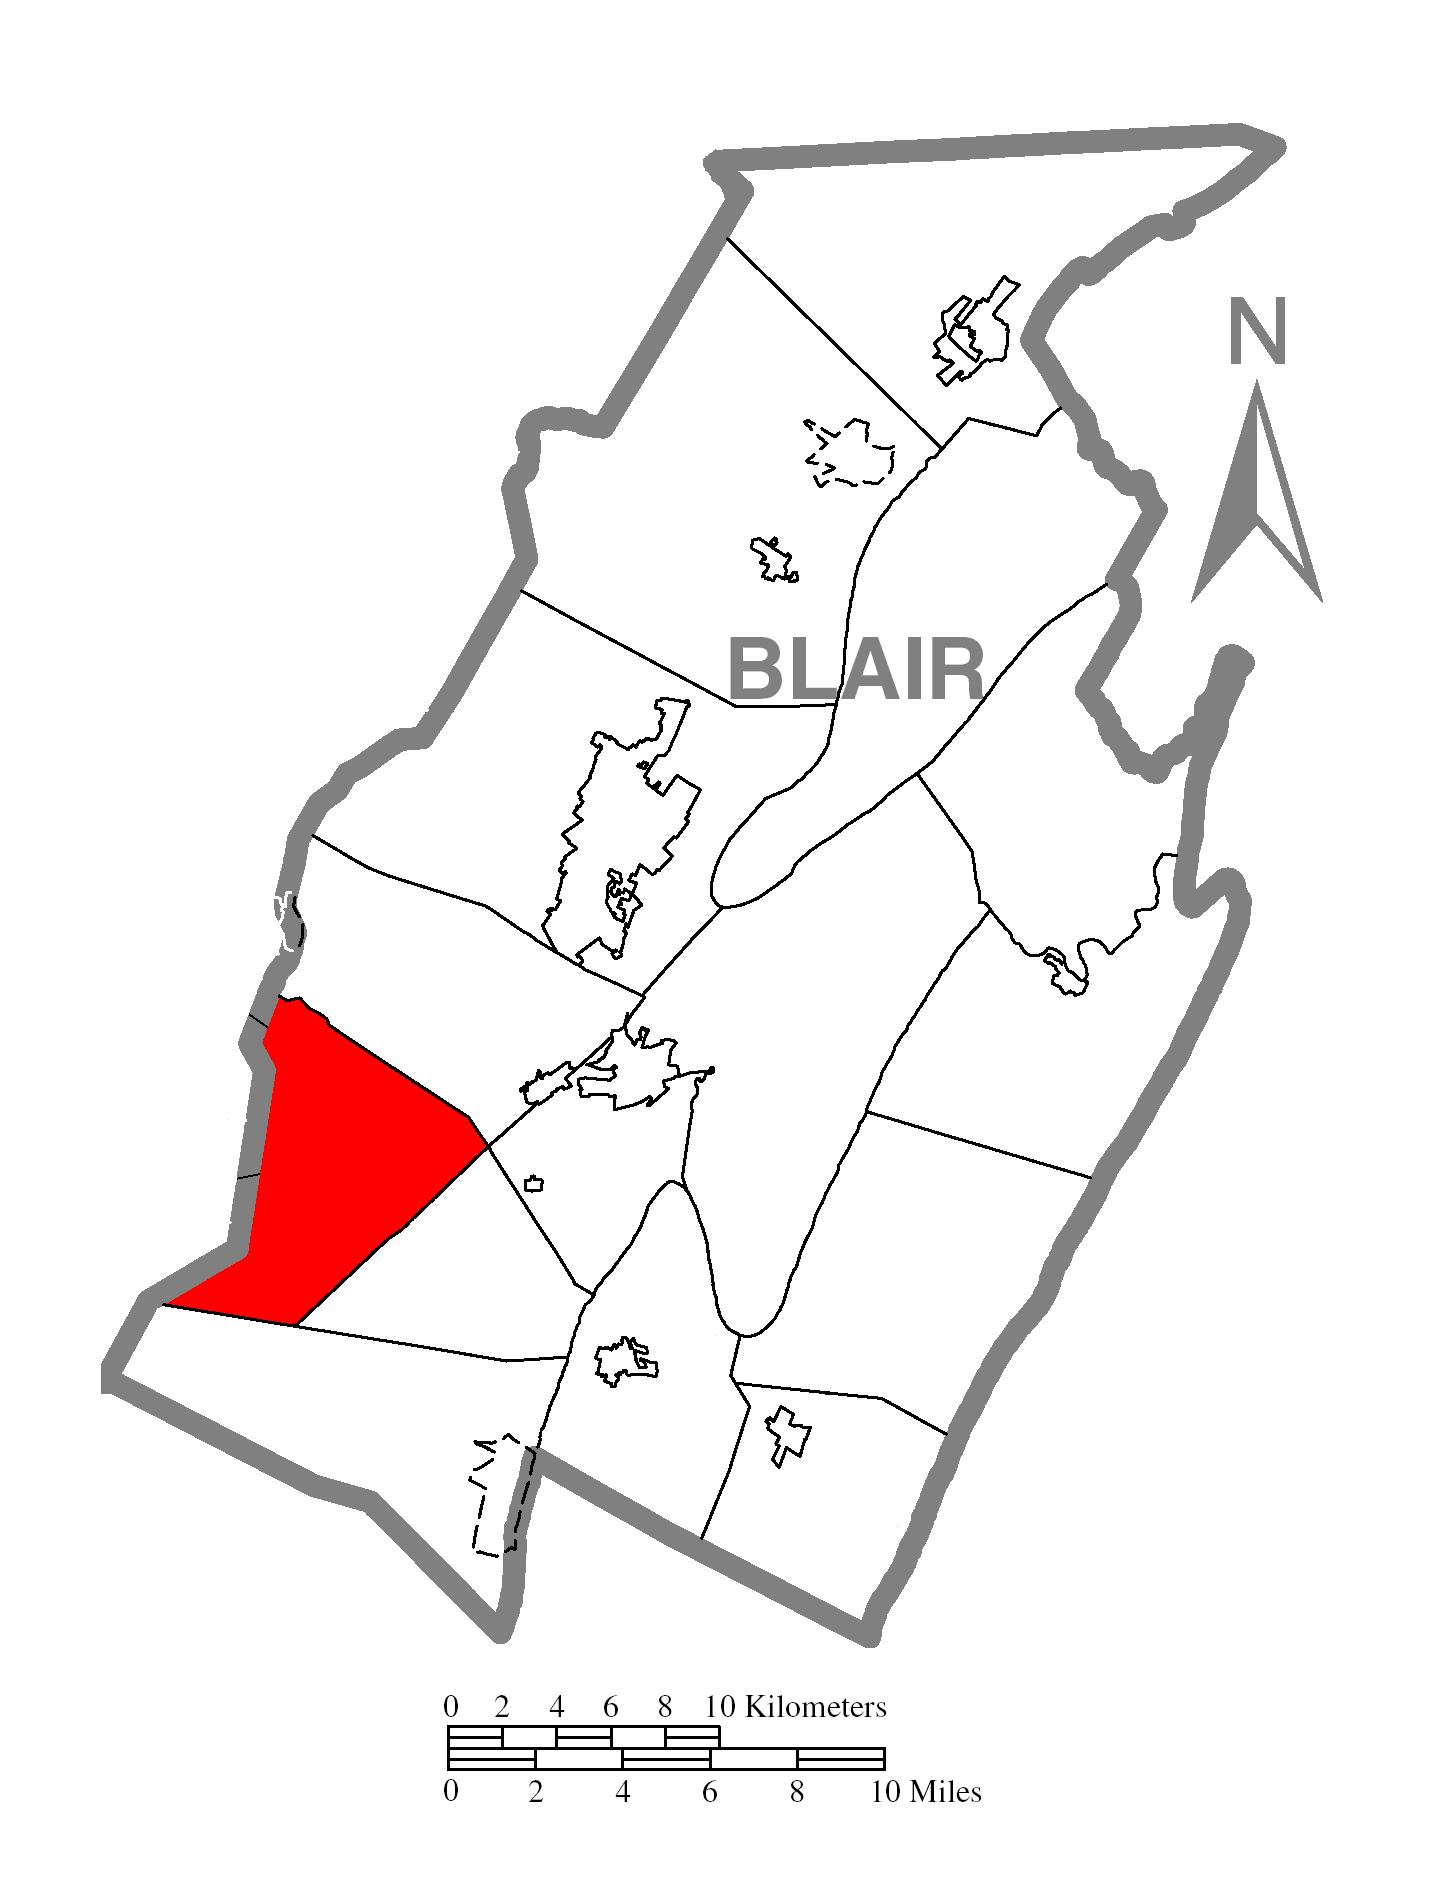 File:Map of Juniata Township, Blair County, Pennsylvaniajuniata township